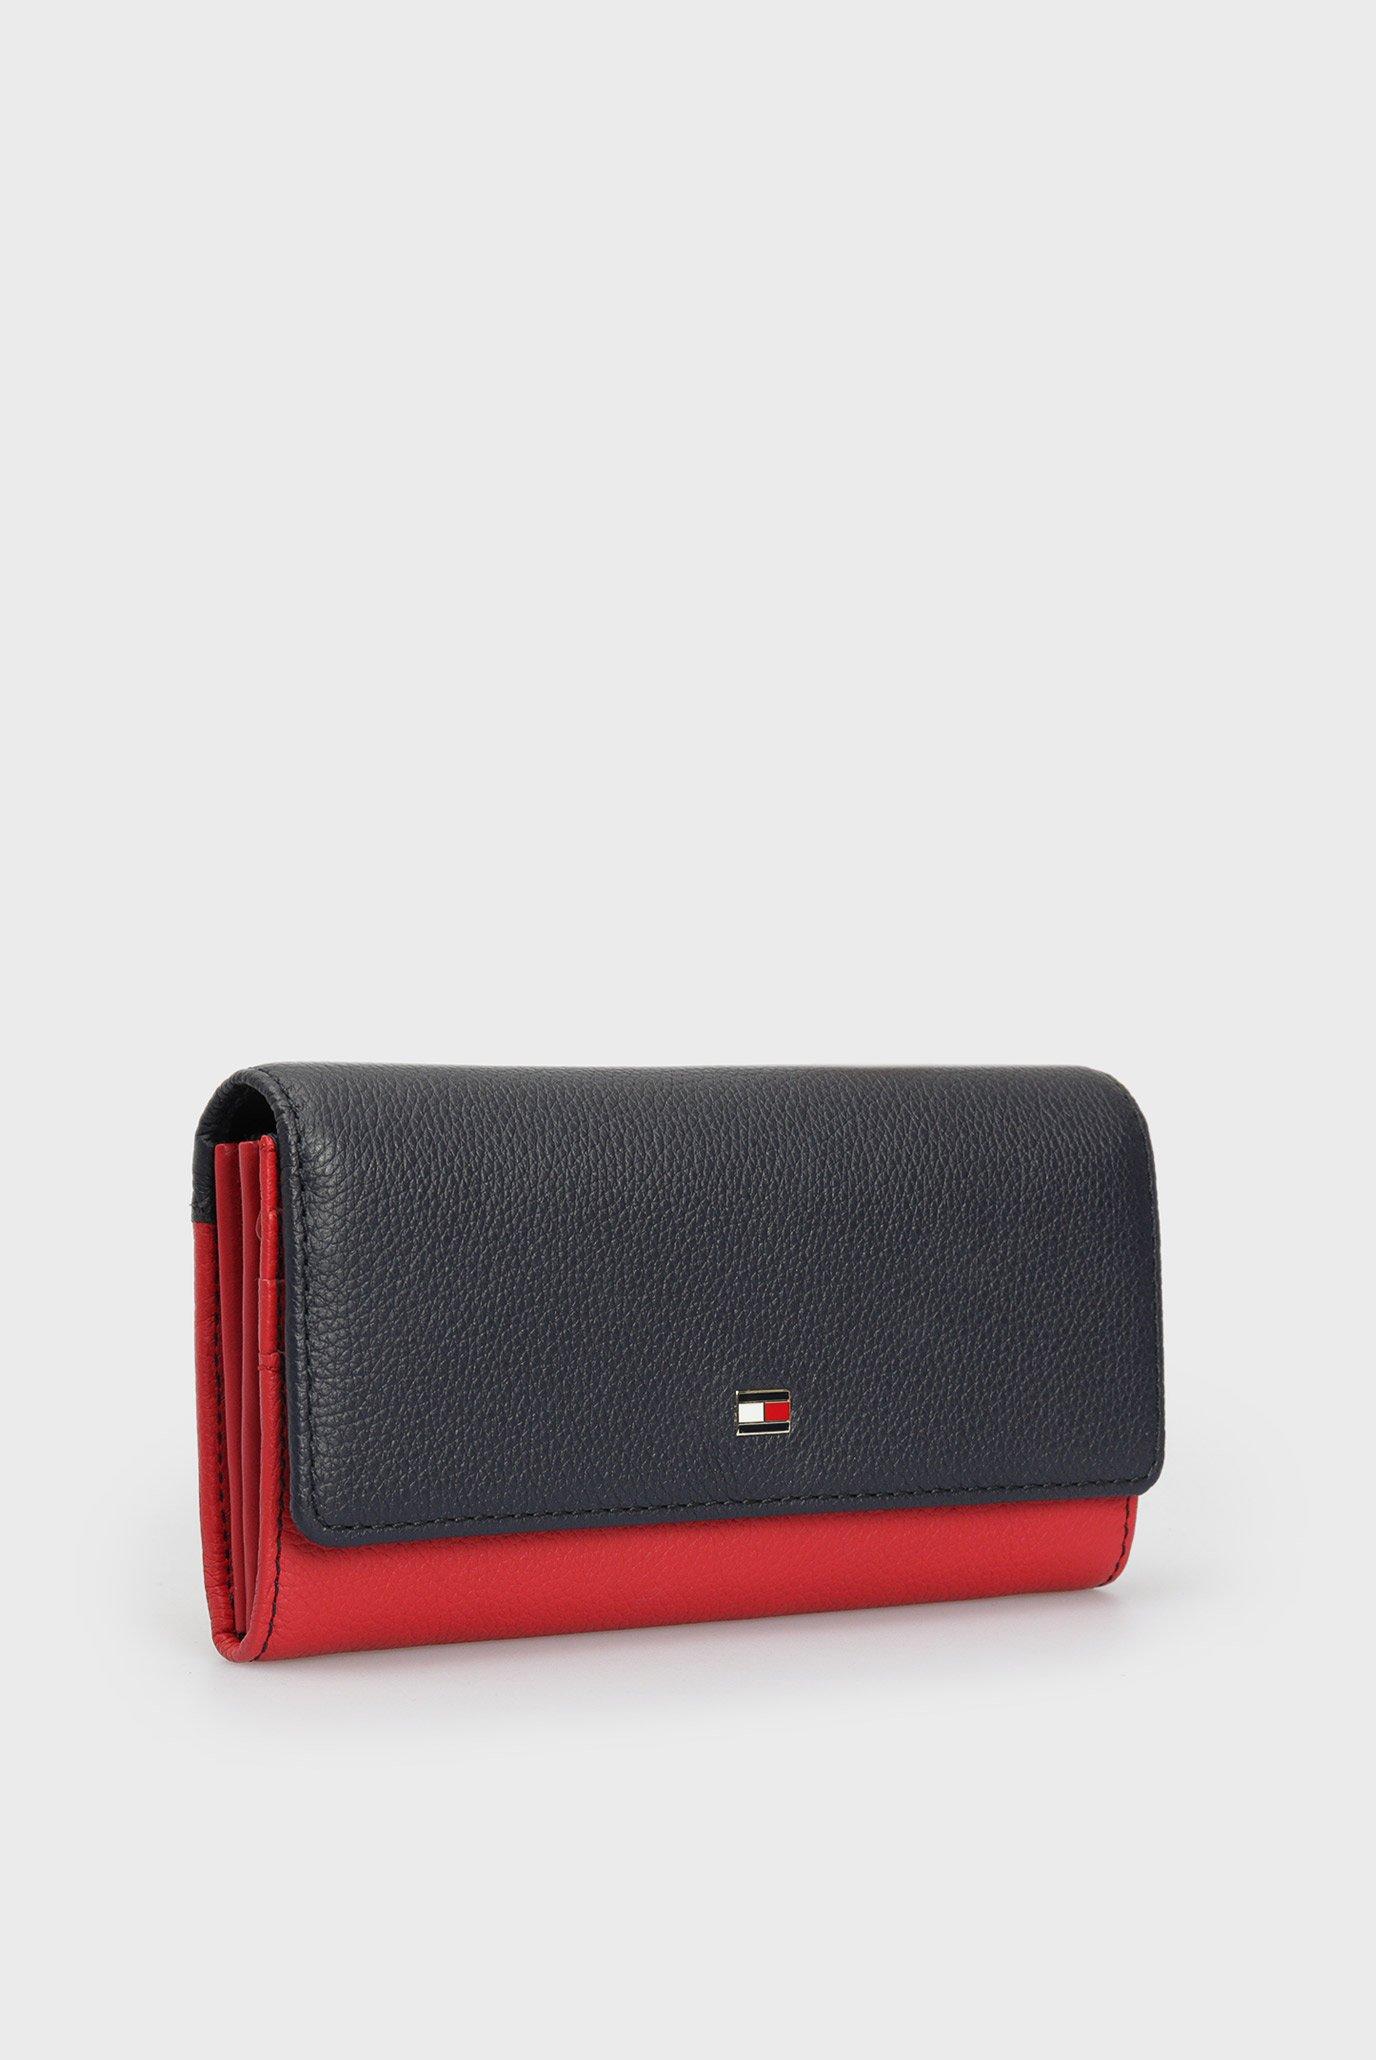 f41f954f02b3 Купить Женский кожаный кошелек Tommy Hilfiger Tommy Hilfiger AW0AW04425 –  Киев, Украина. Цены в интернет магазине MD Fashion